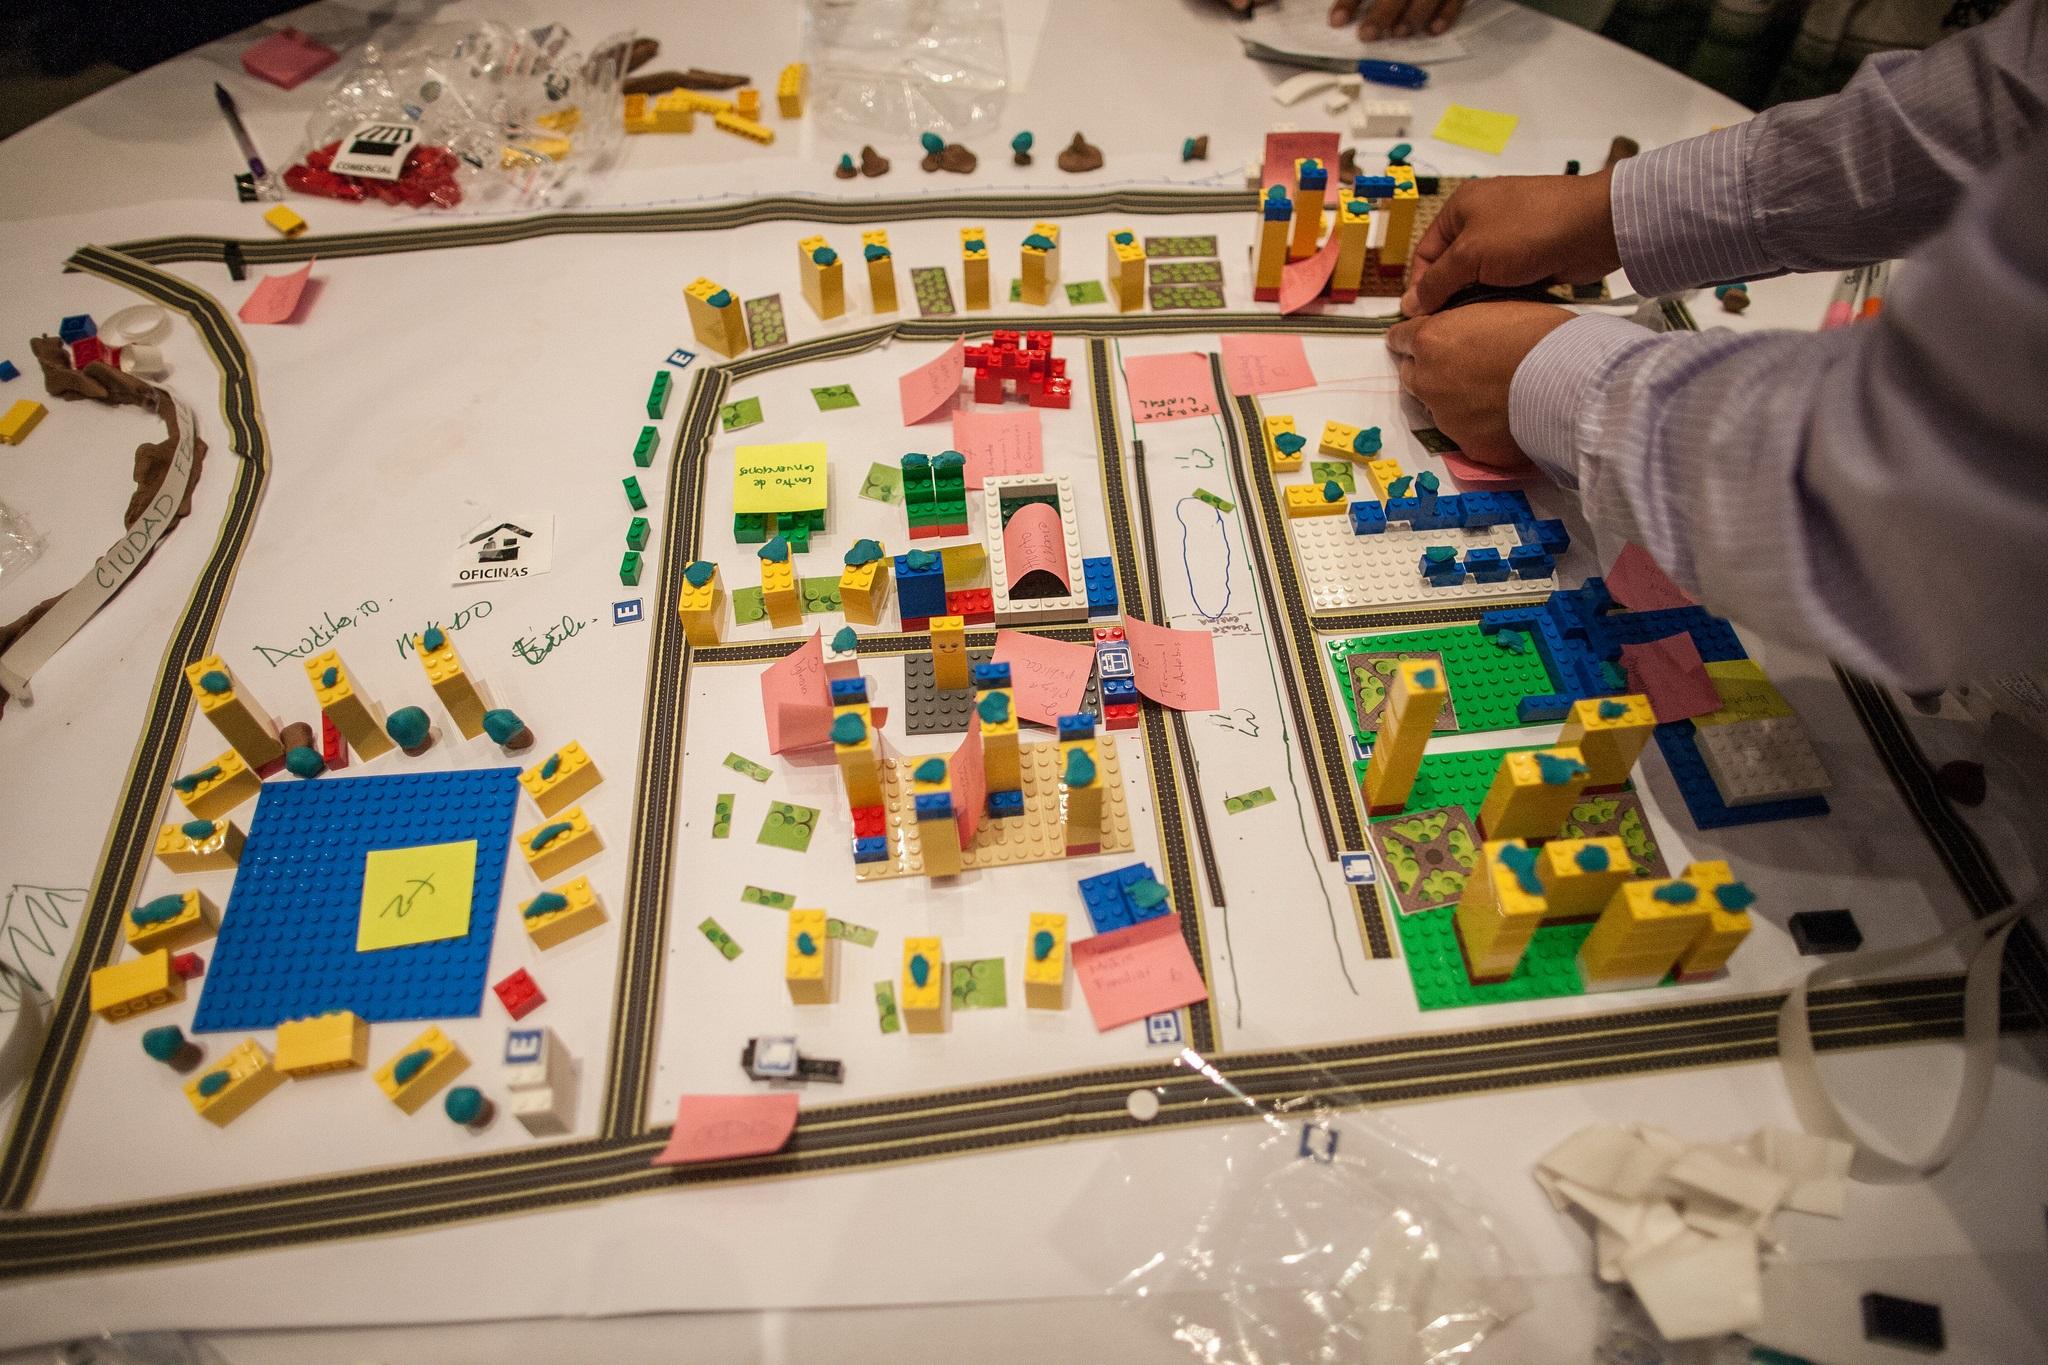 Workshop participants design their cities